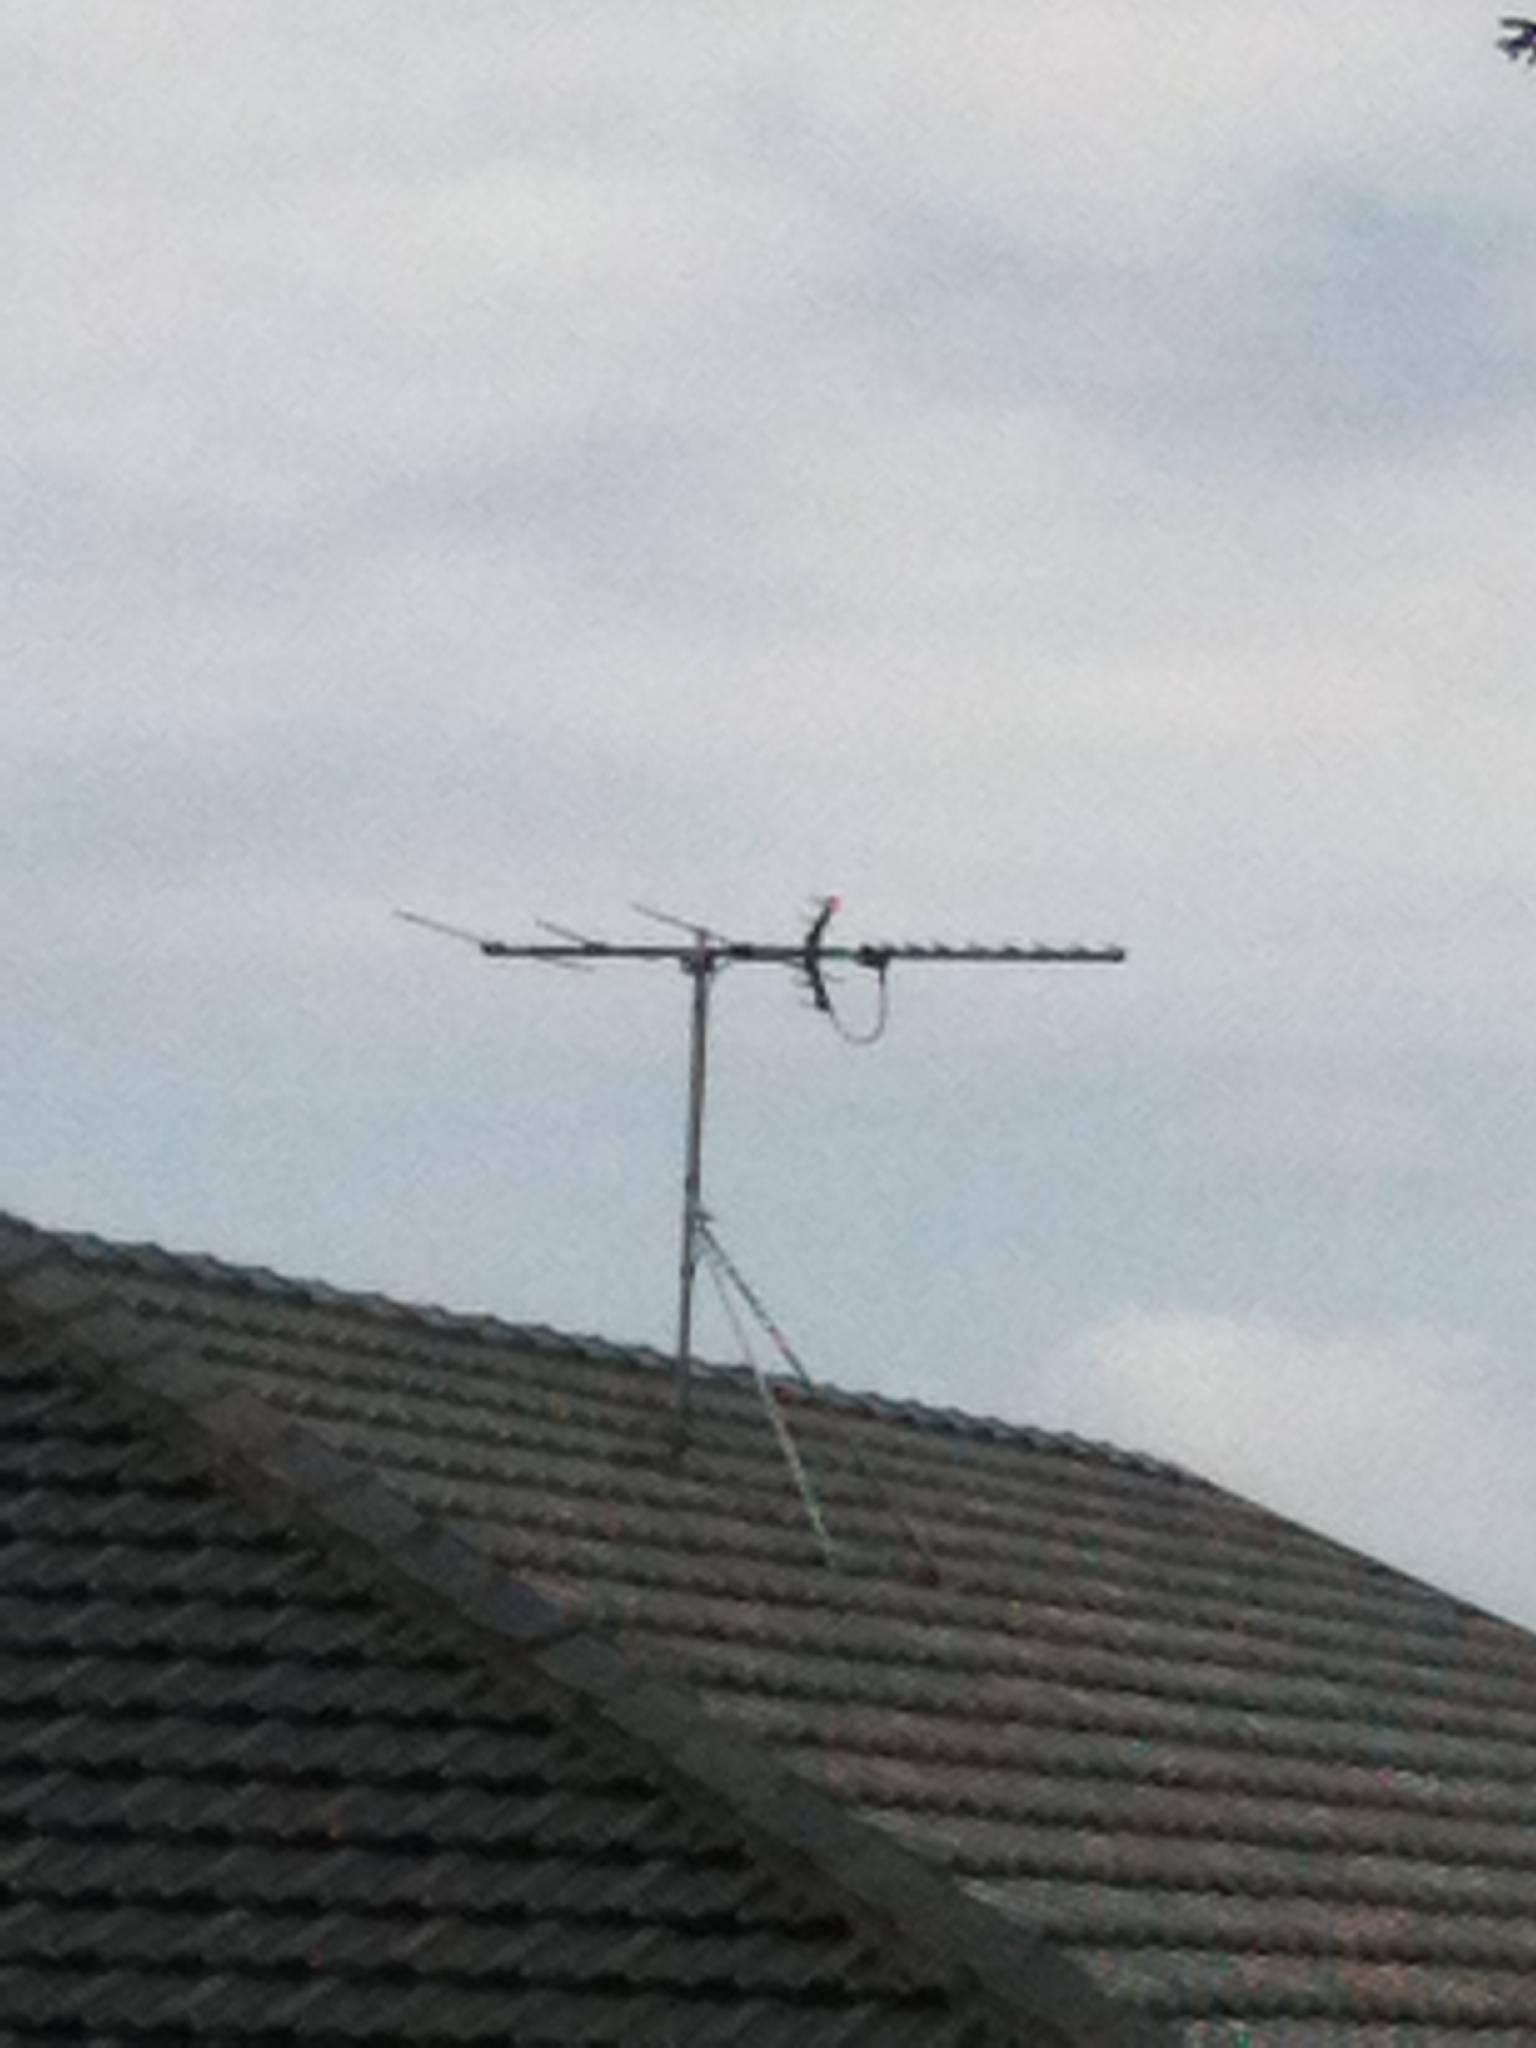 UHF Aerial/antenna